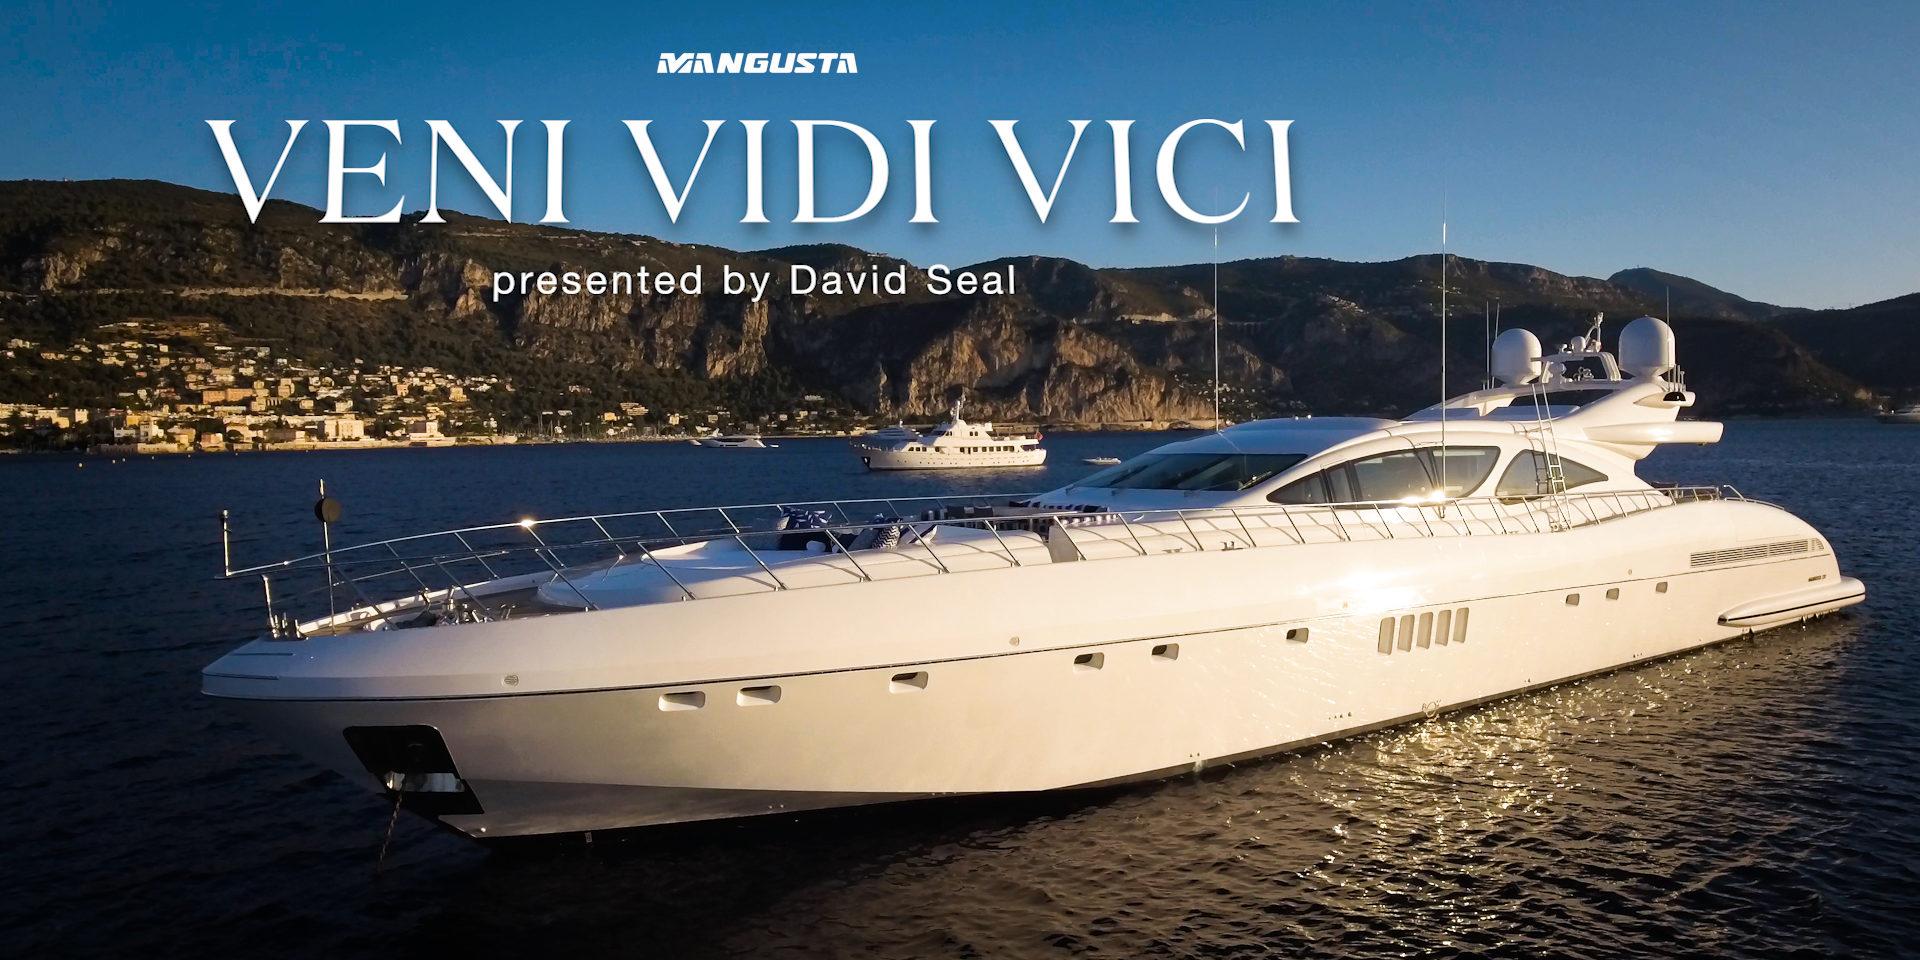 MANGUSTA 130 'VENI VIDI VICI' – SHORT DOCUMENTARY